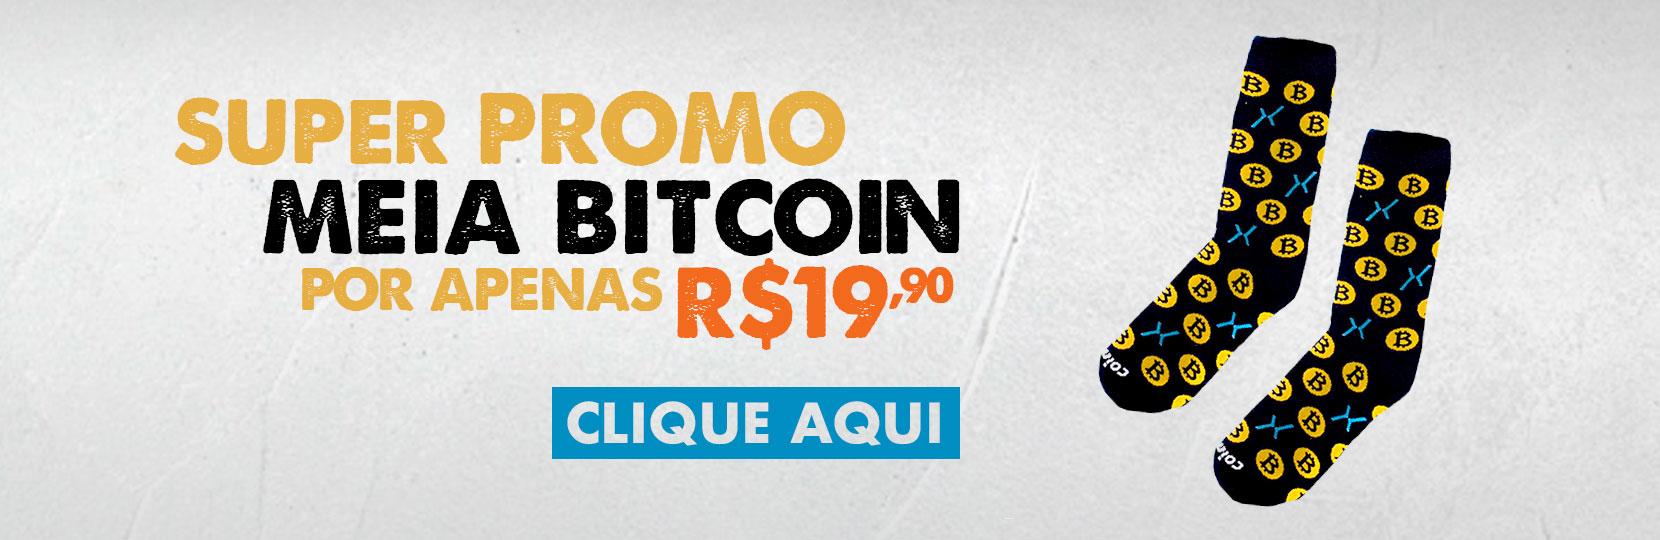 Meia Bitcoin